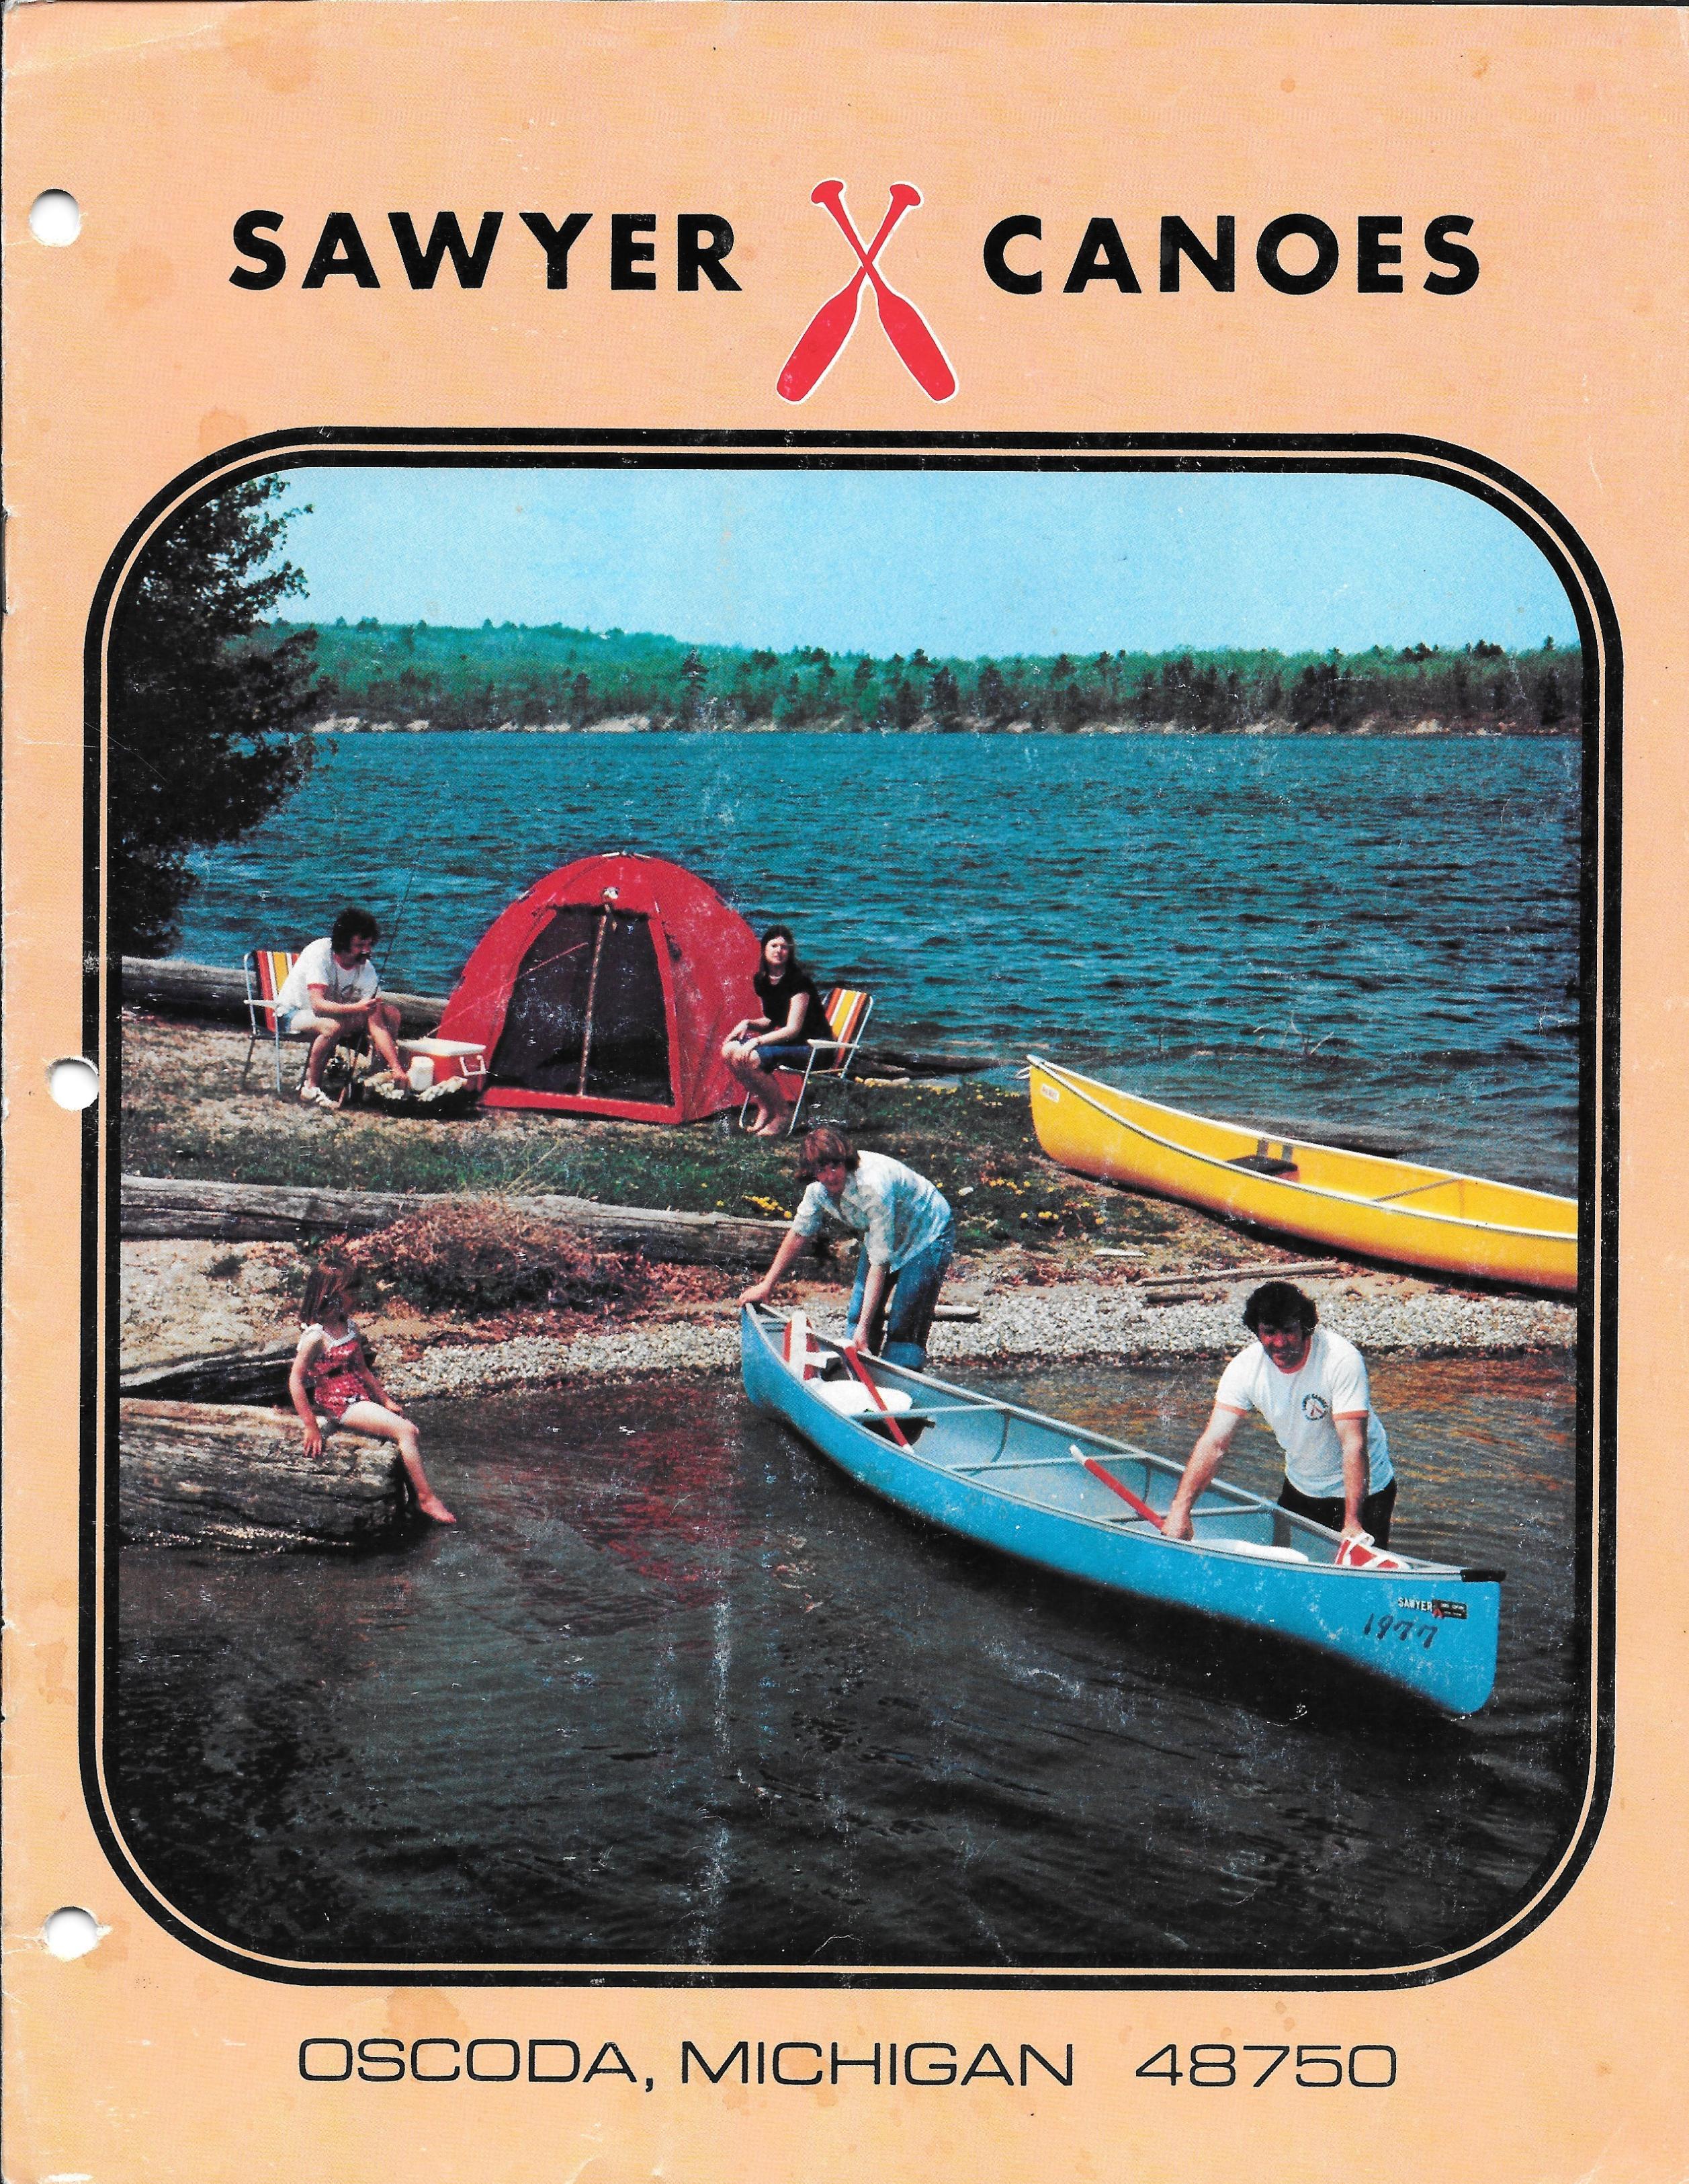 1977 Sawyer Catalog Cover